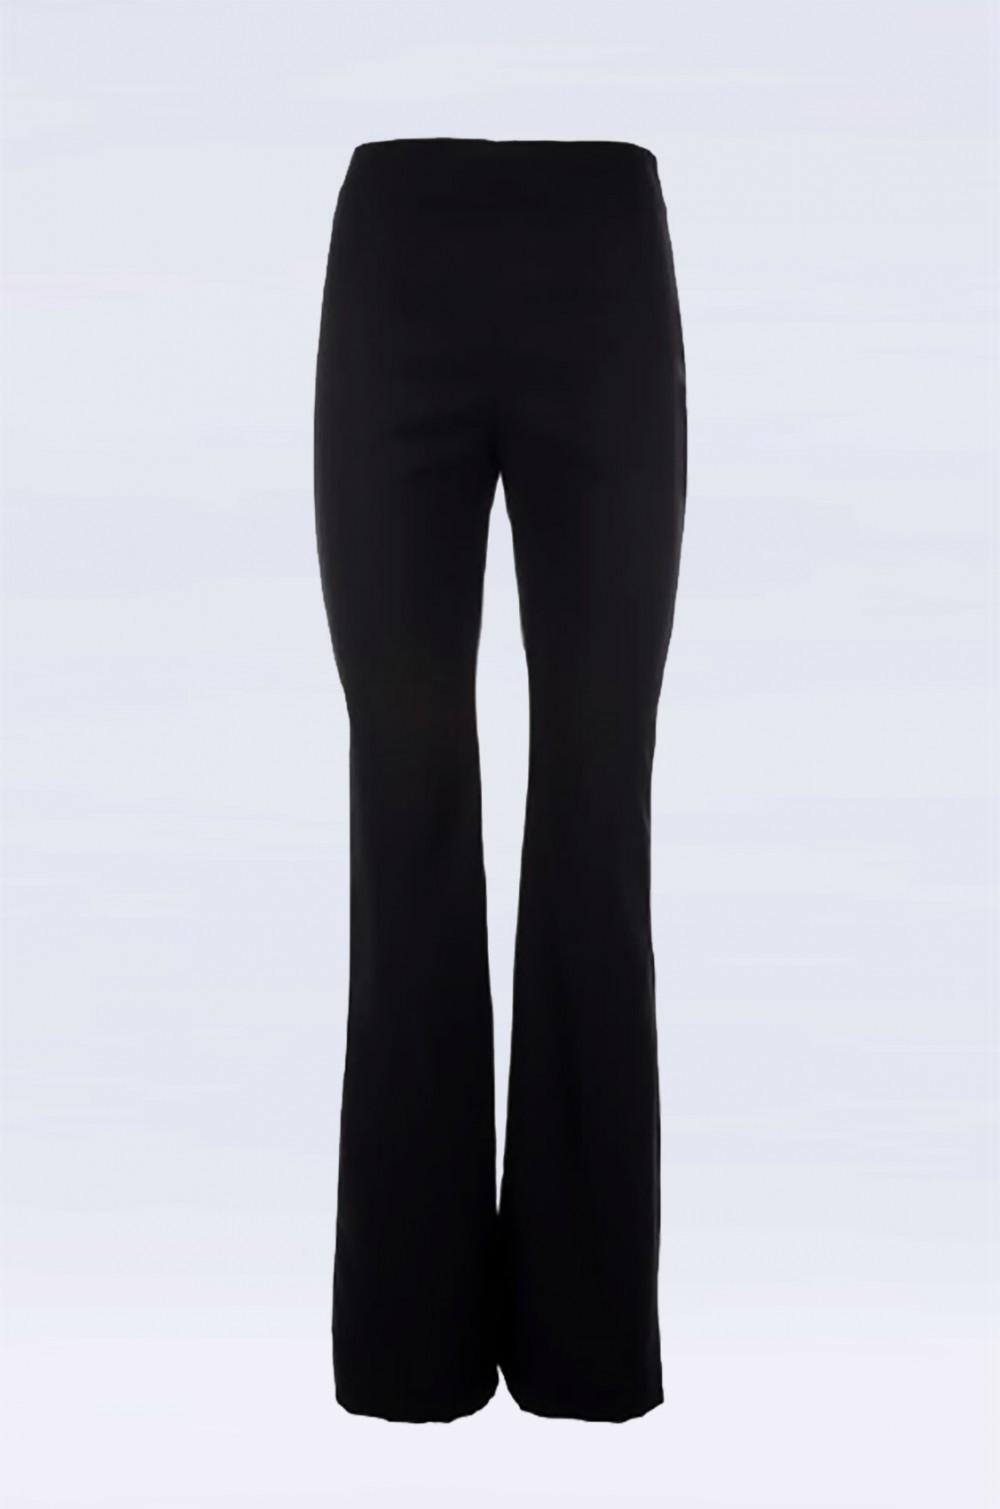 Pantalone nero a vita alta